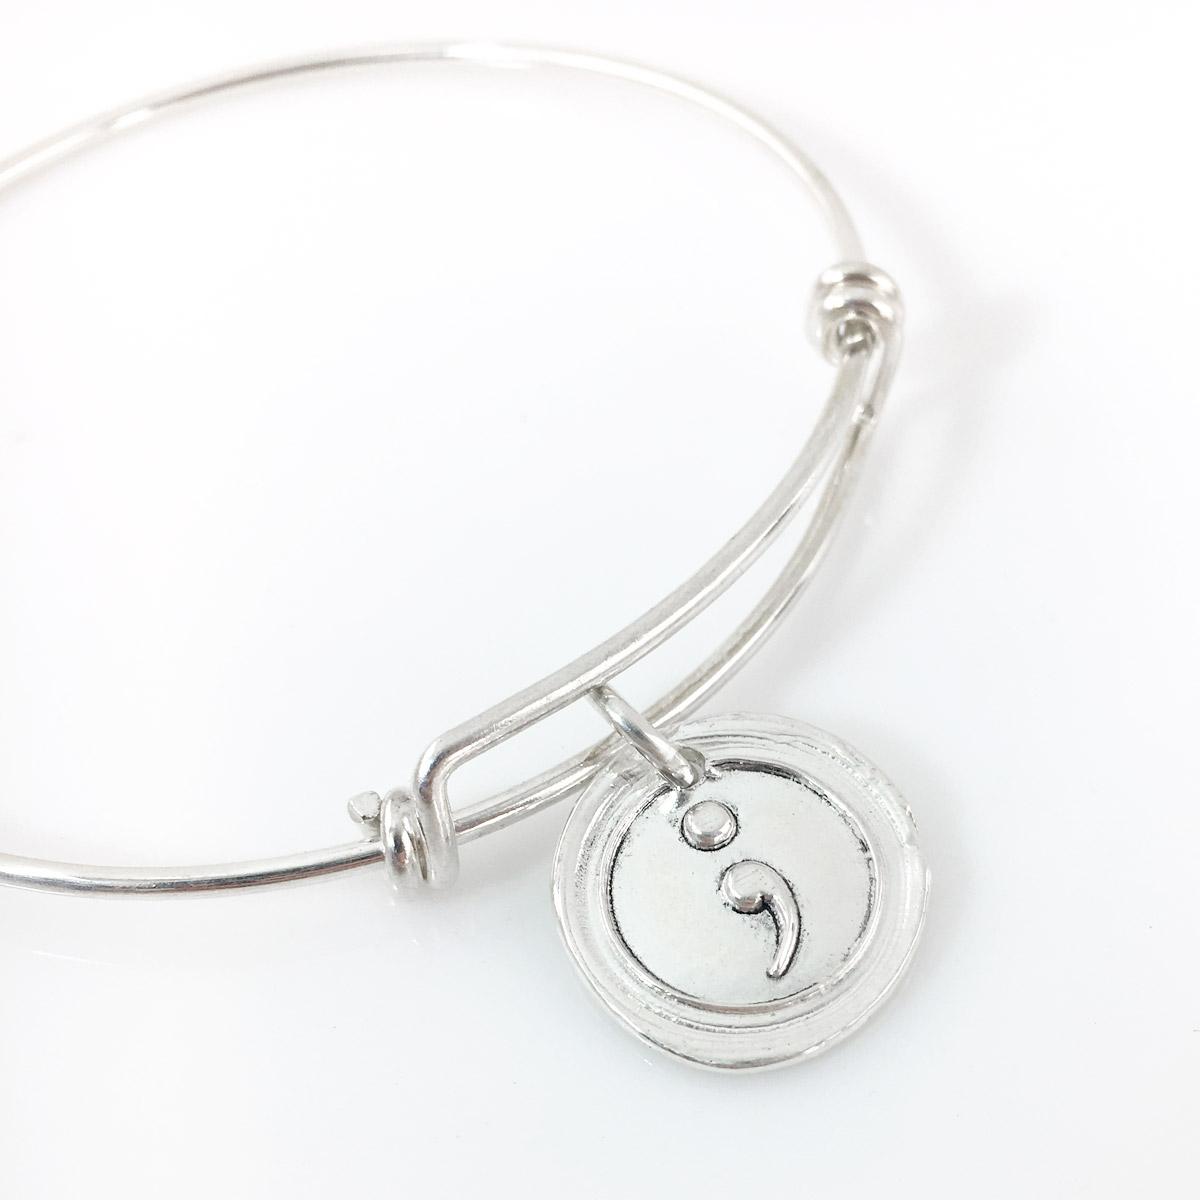 Semicolon Wax Seal Inspired Bangle Bracelet